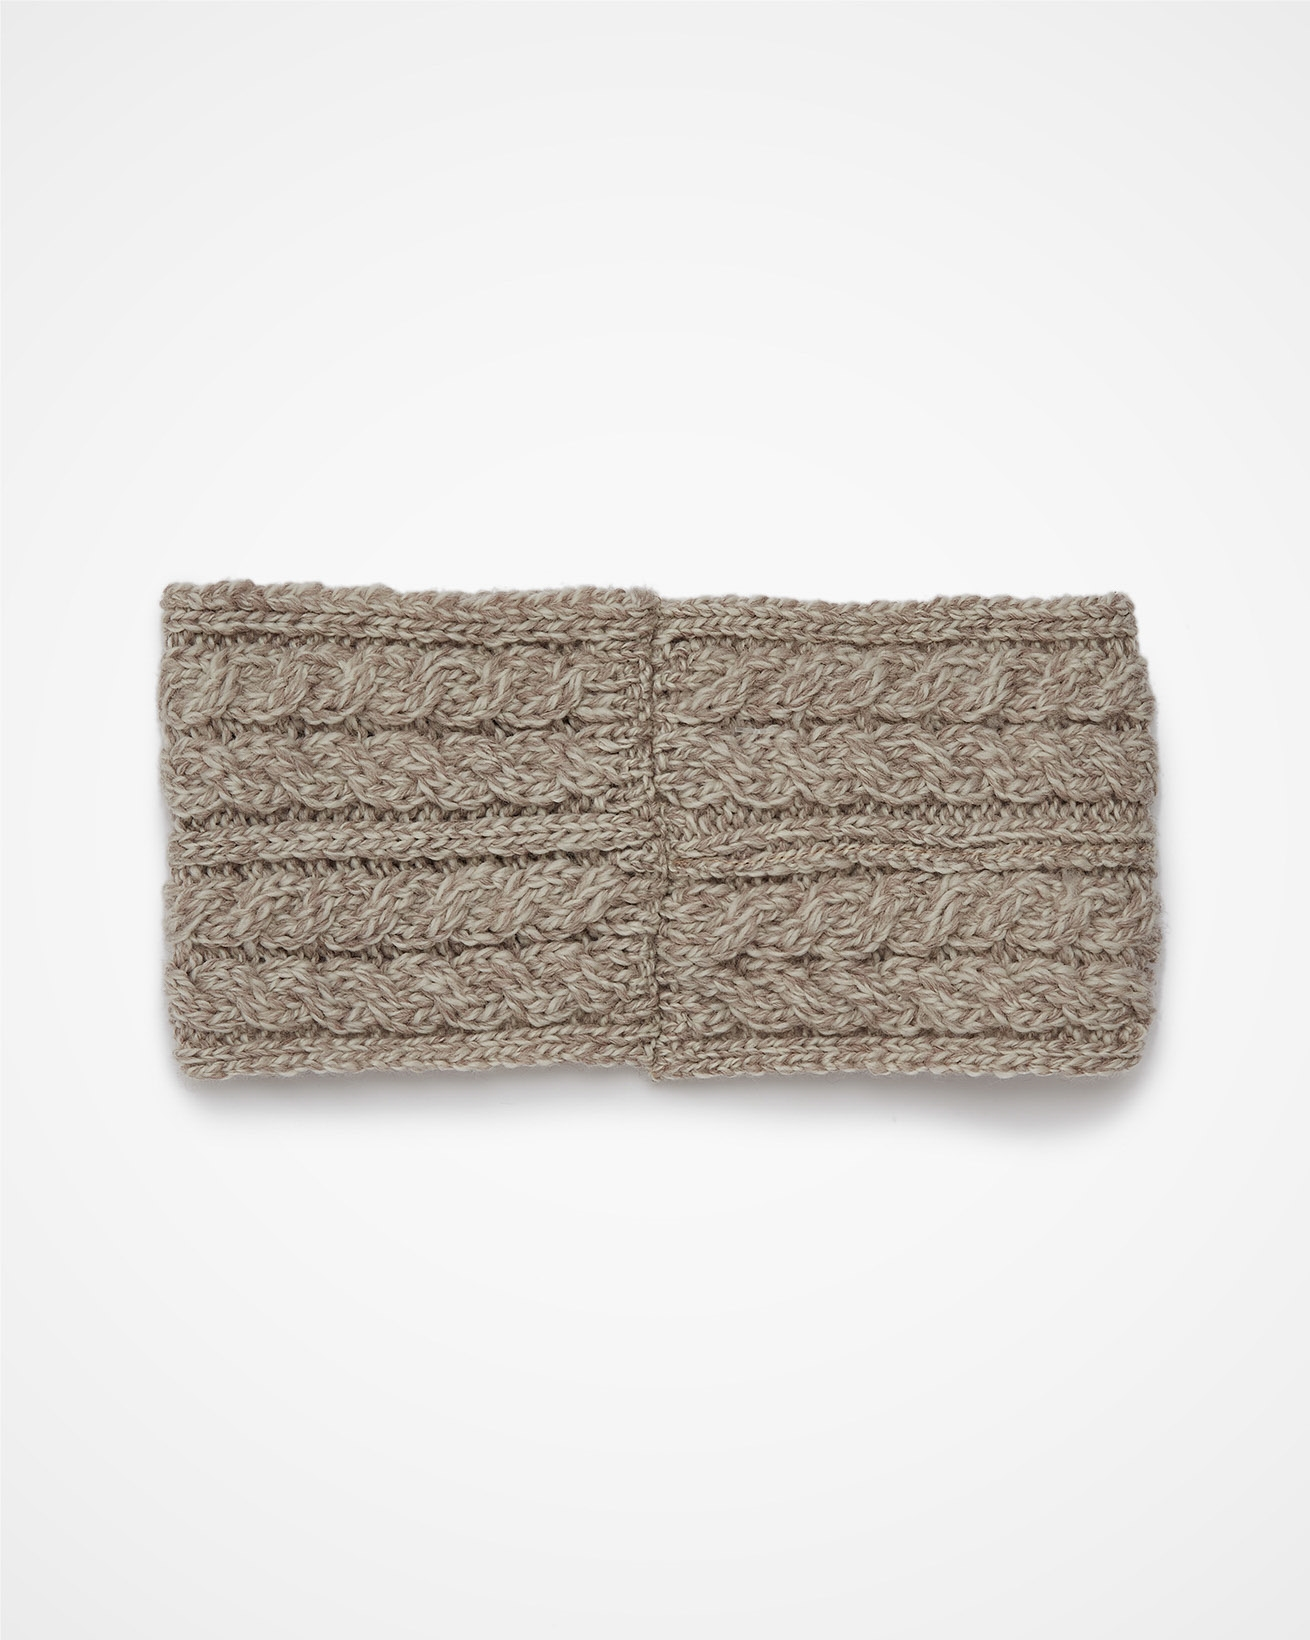 7872_aran-cable-headband_oatmeal-fleck_2_cutout_web.jpg